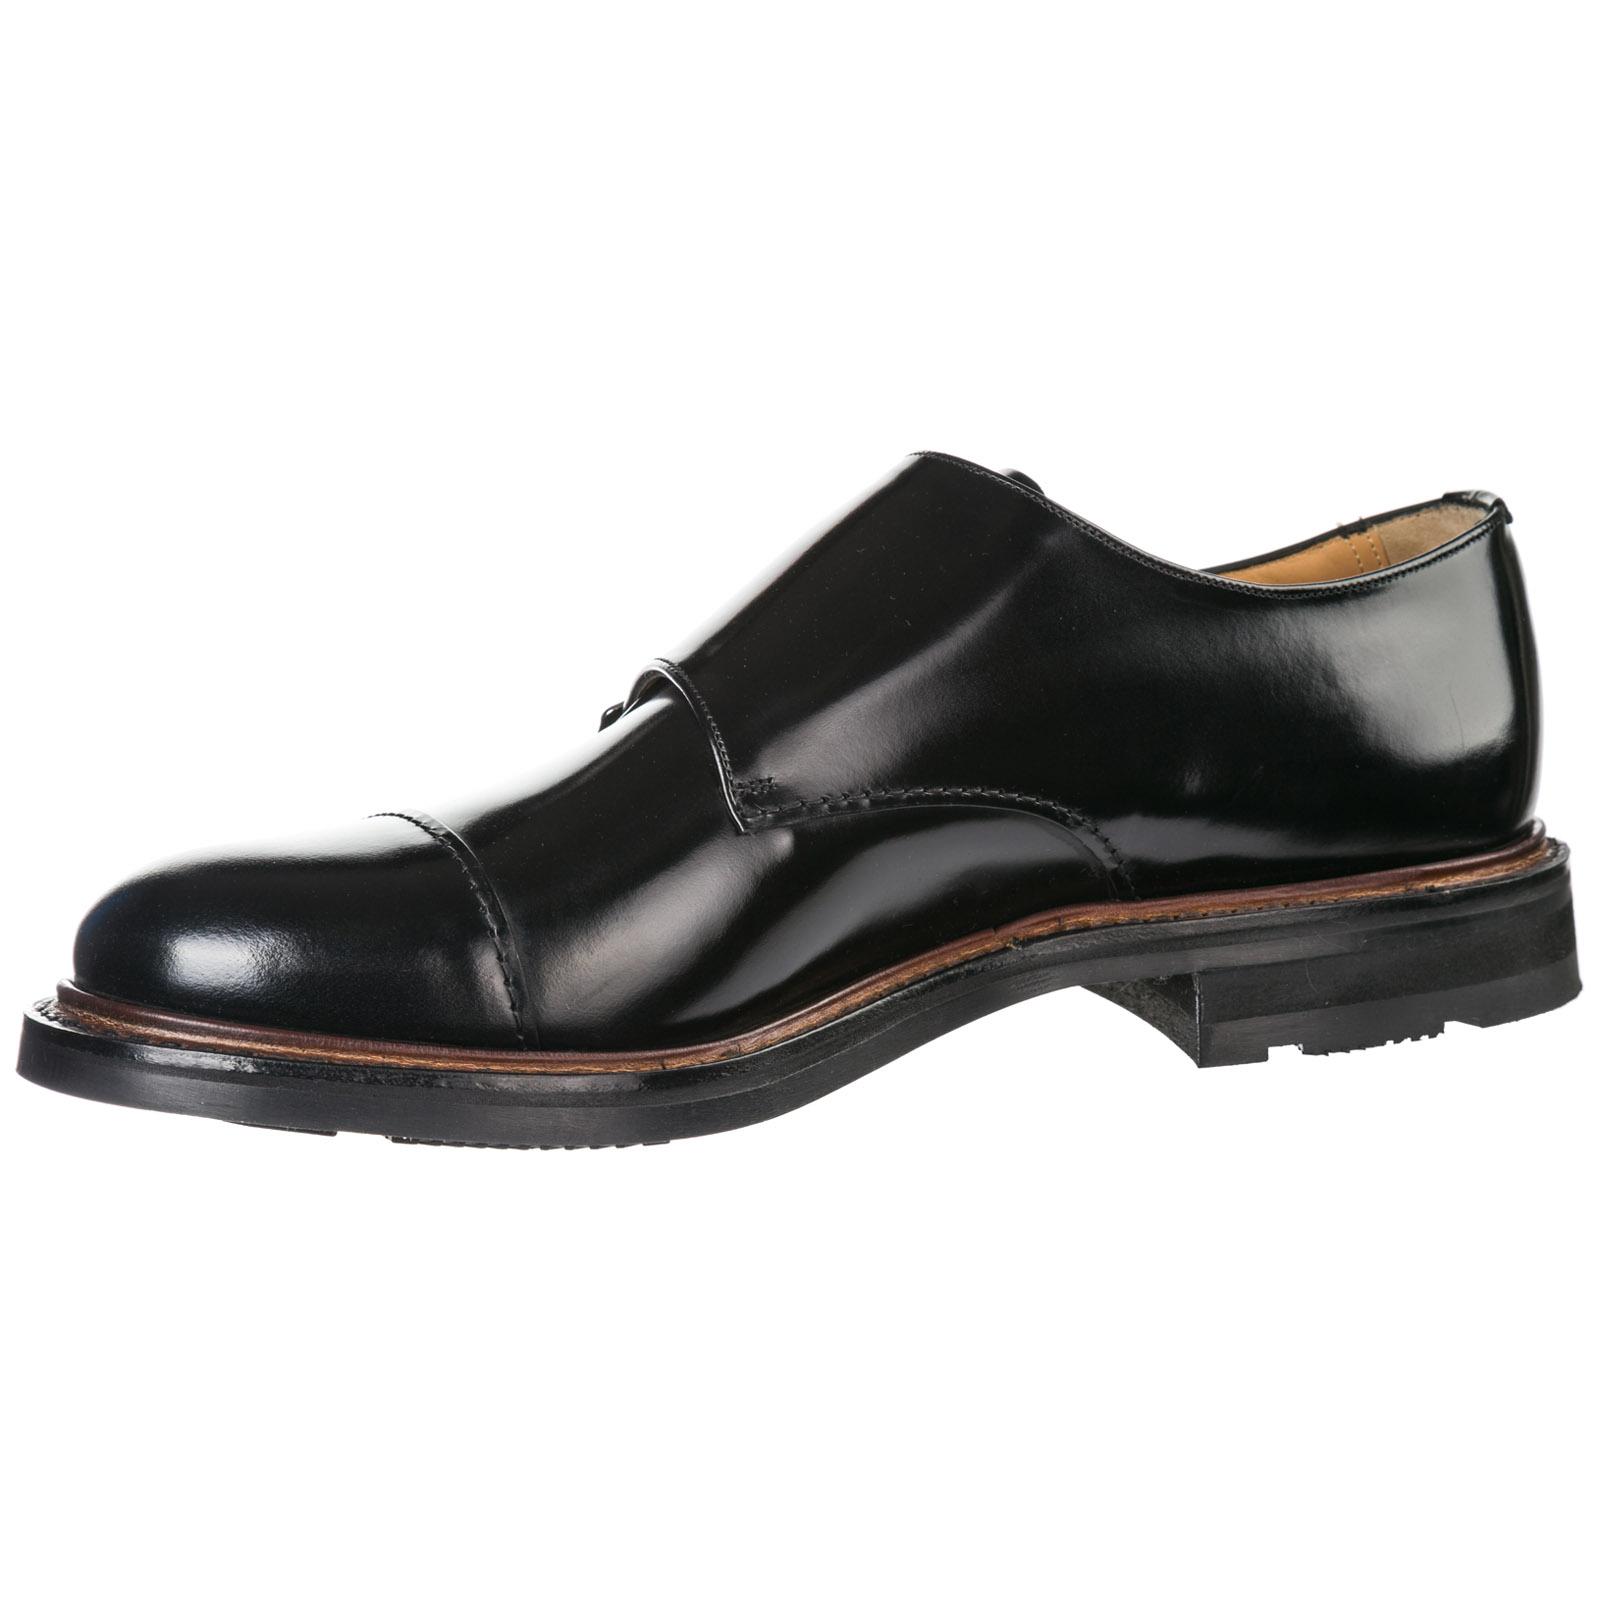 Men's classic leather formal shoes slip on monk strap wadebridge